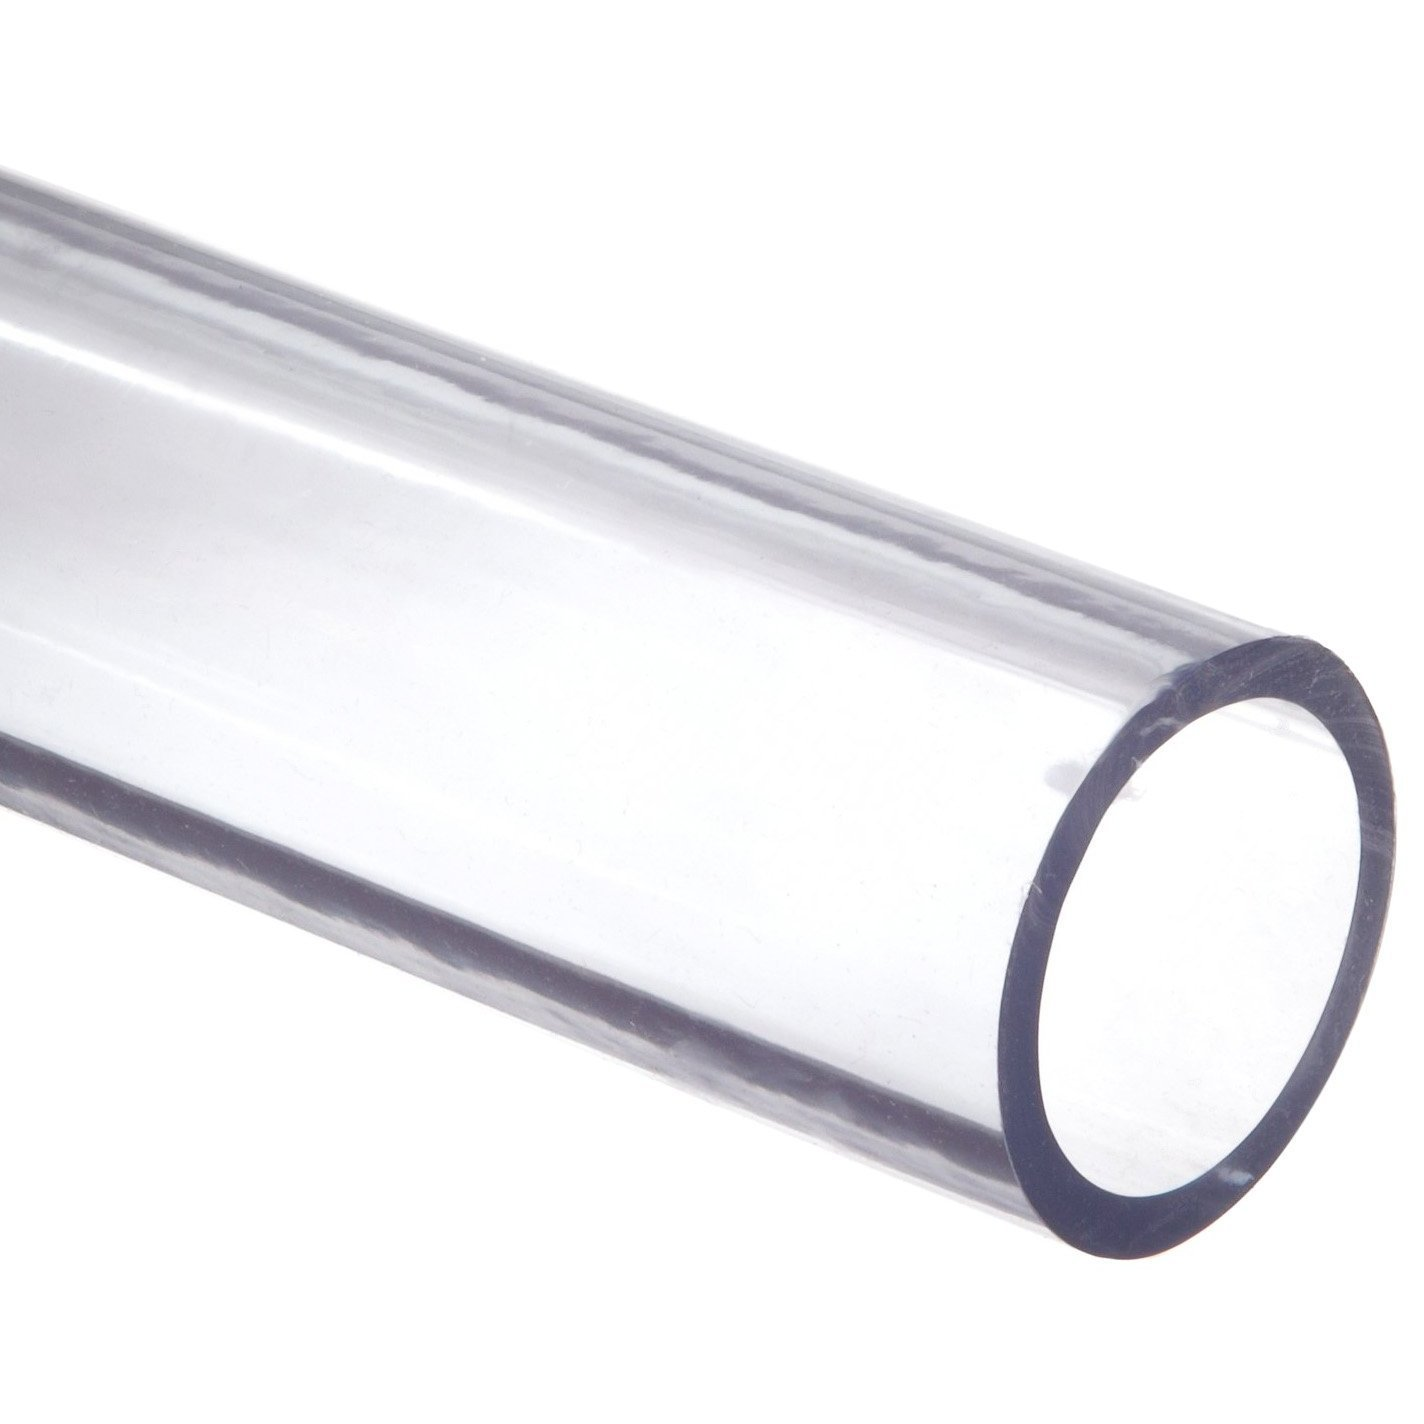 Dynalon 610855-38 Transparent Vinyl Food Grade Tubing, 1-1/4